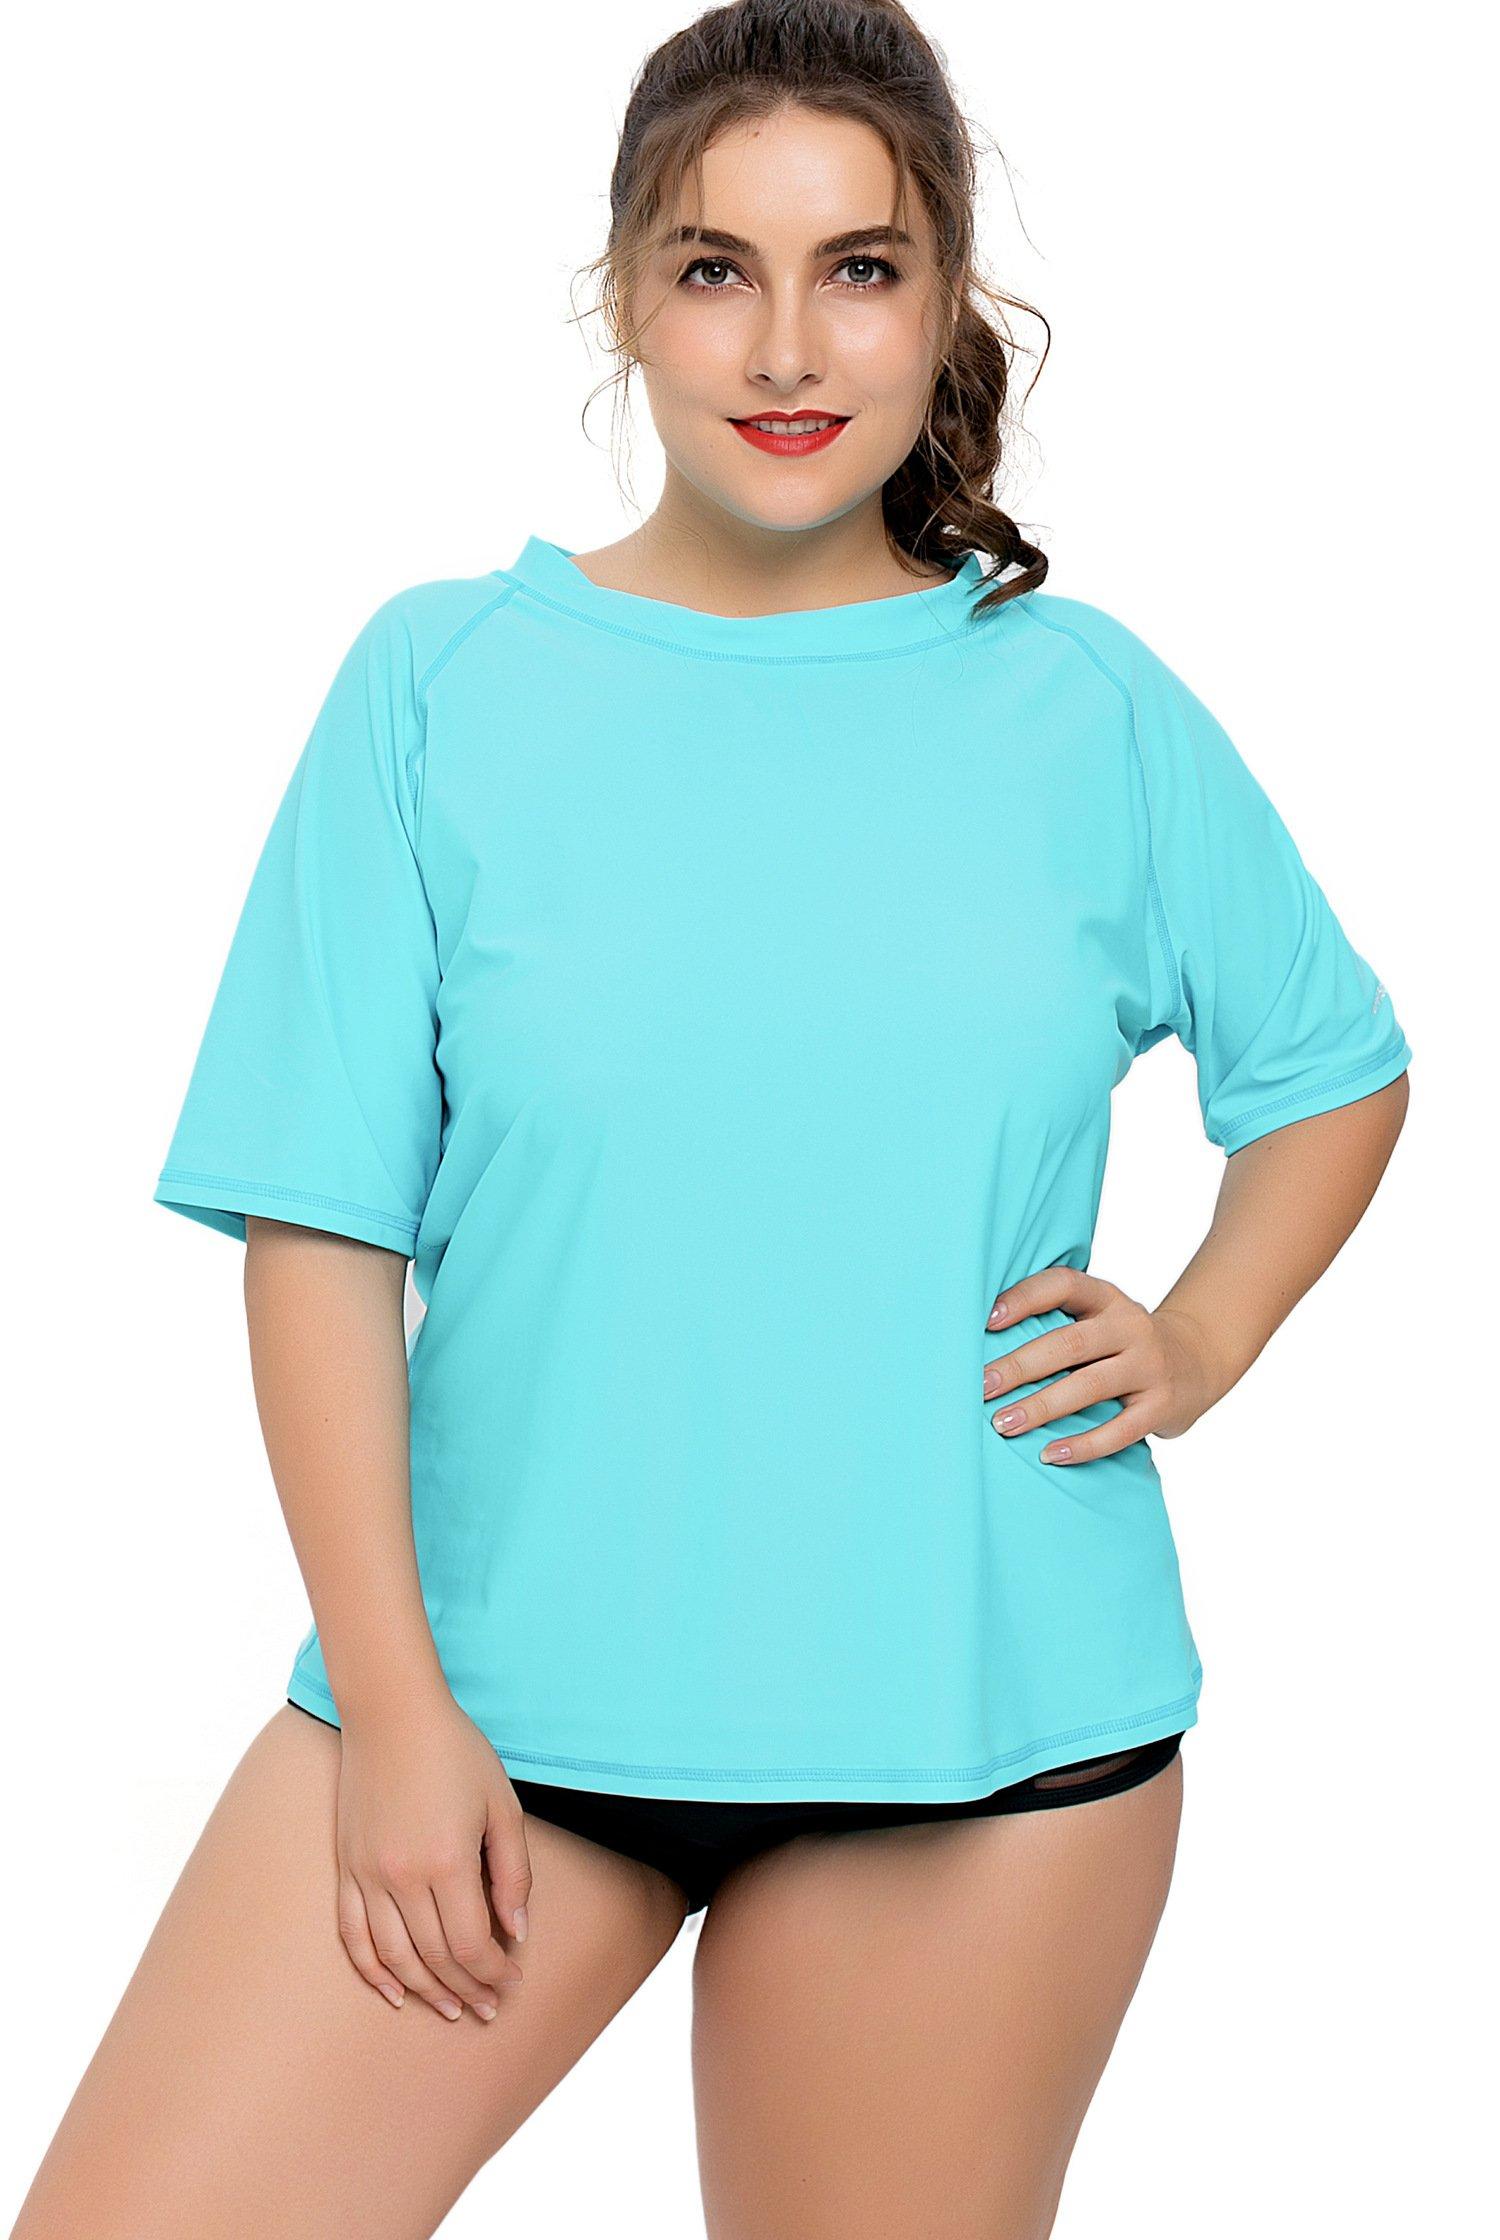 Vegatos Women Plus Size Rash Guard Swimsuit Quick Dry Athletic Swim Tops UPF 50+